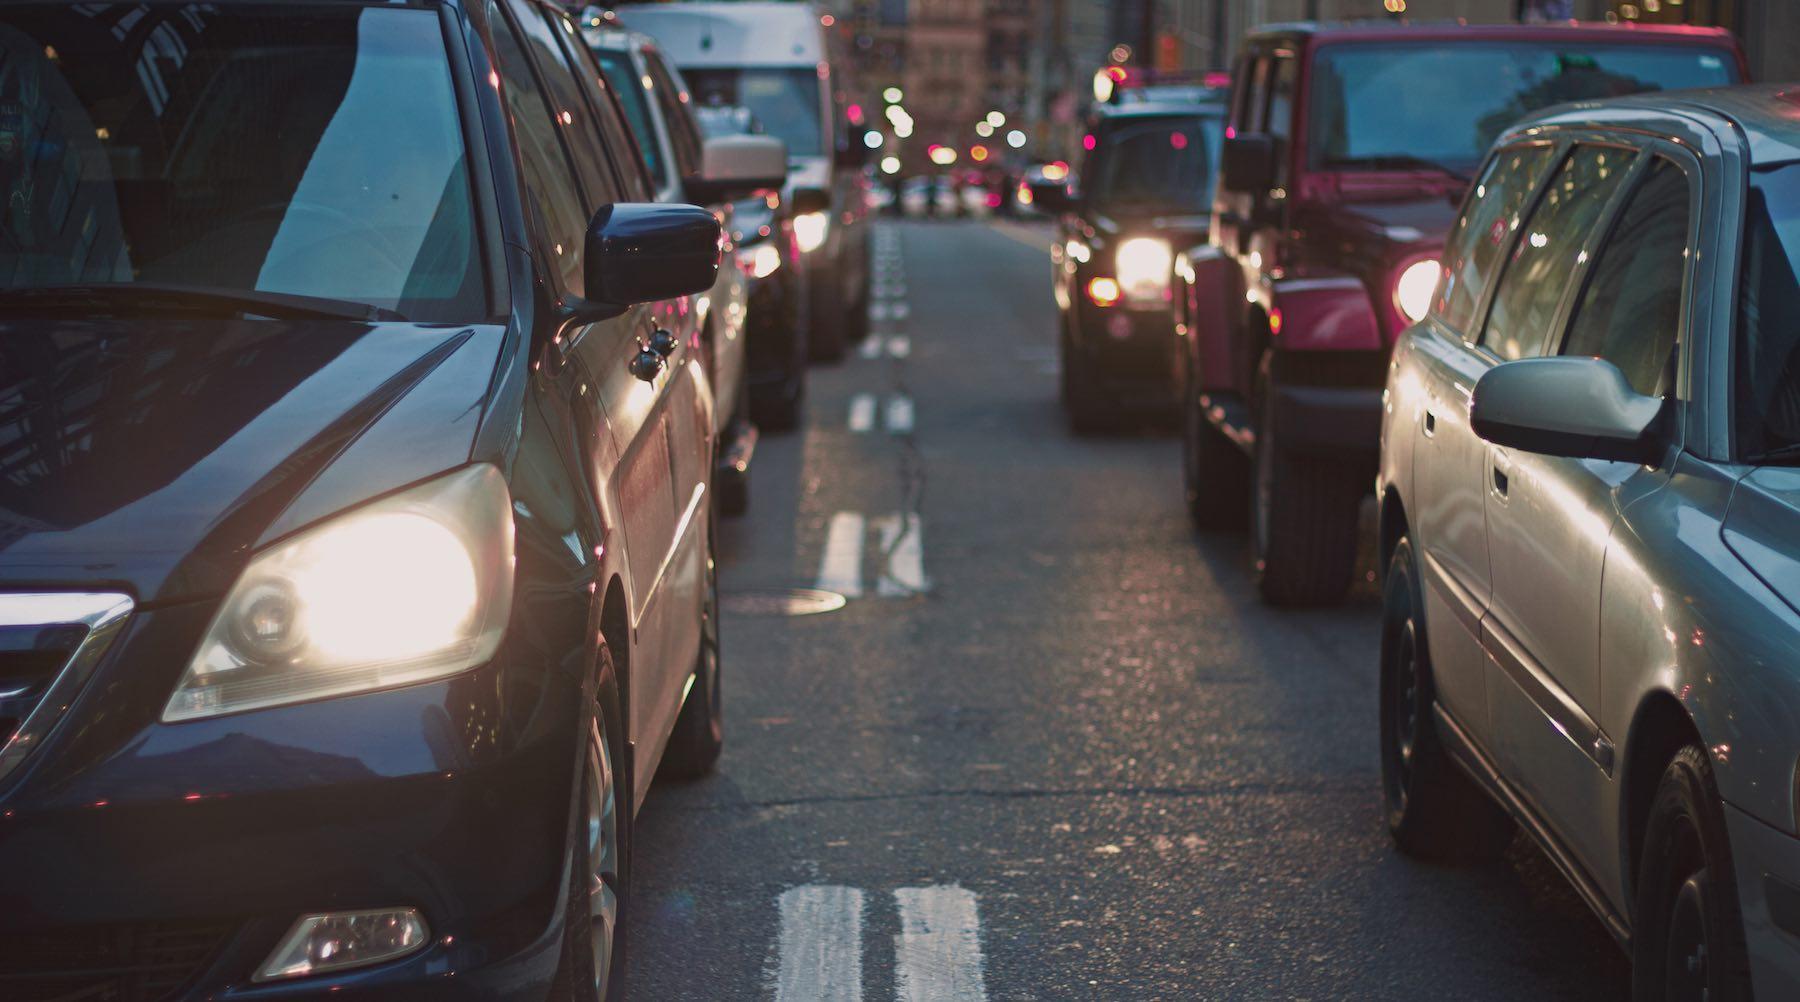 traffic-1526336935276.jpg